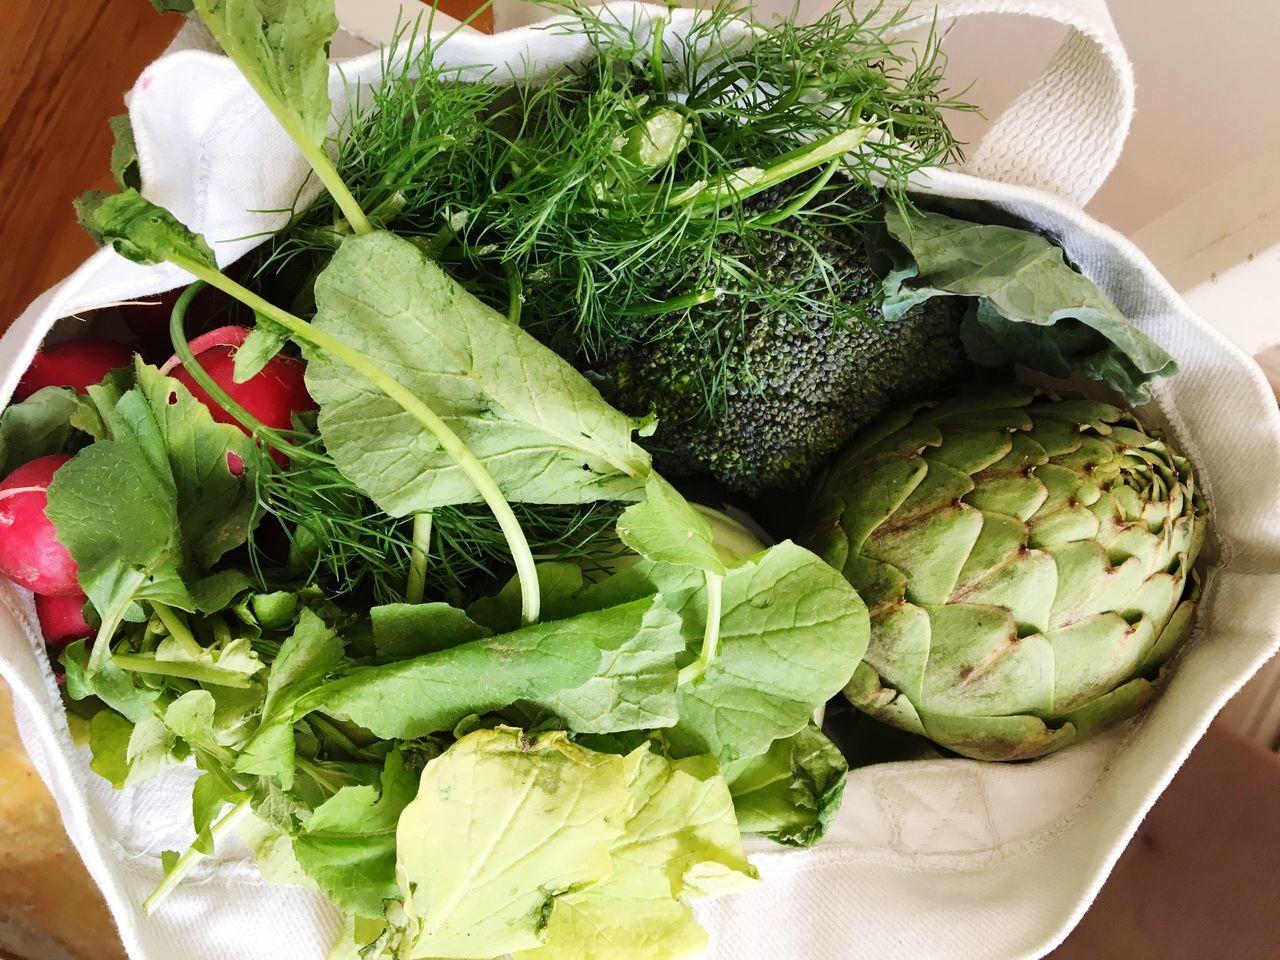 Greens Grocery Shopping Organic Vegetables Organic Food Freshness Healthy Eating High Angle View Directly Above Green Color Vegetable Verdura Lebensmittel Einkaufen Organic Bio No Plastic Zero Waste Cloth Bag